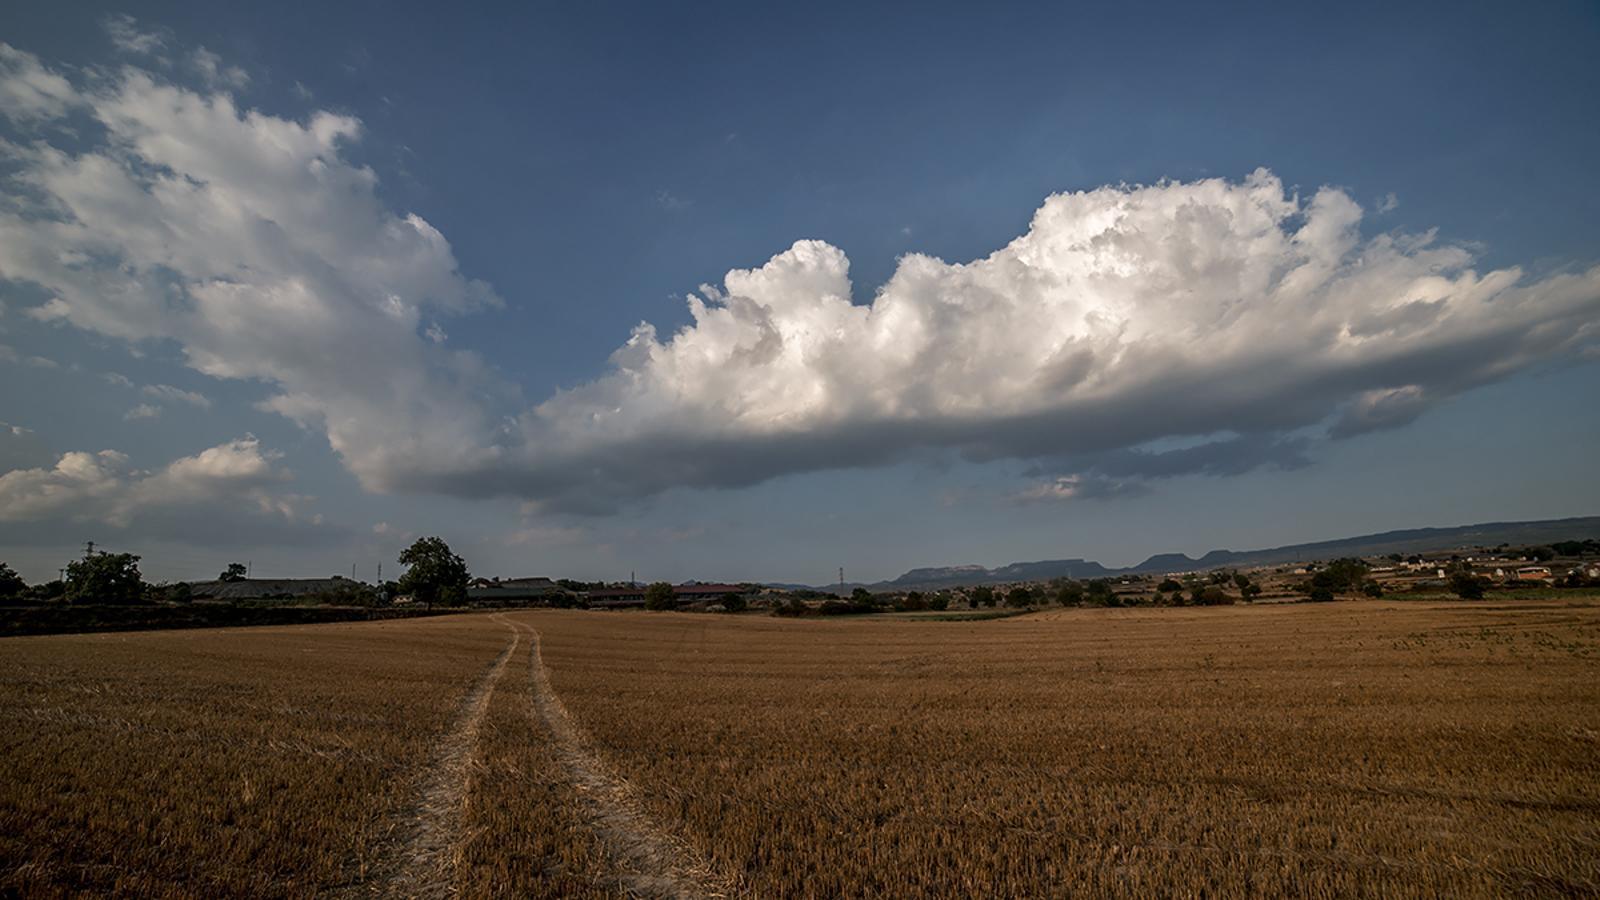 Nuvolades de tarda a Osona, Manlleu, preludi d'inestabilitat / CARME MOLIST